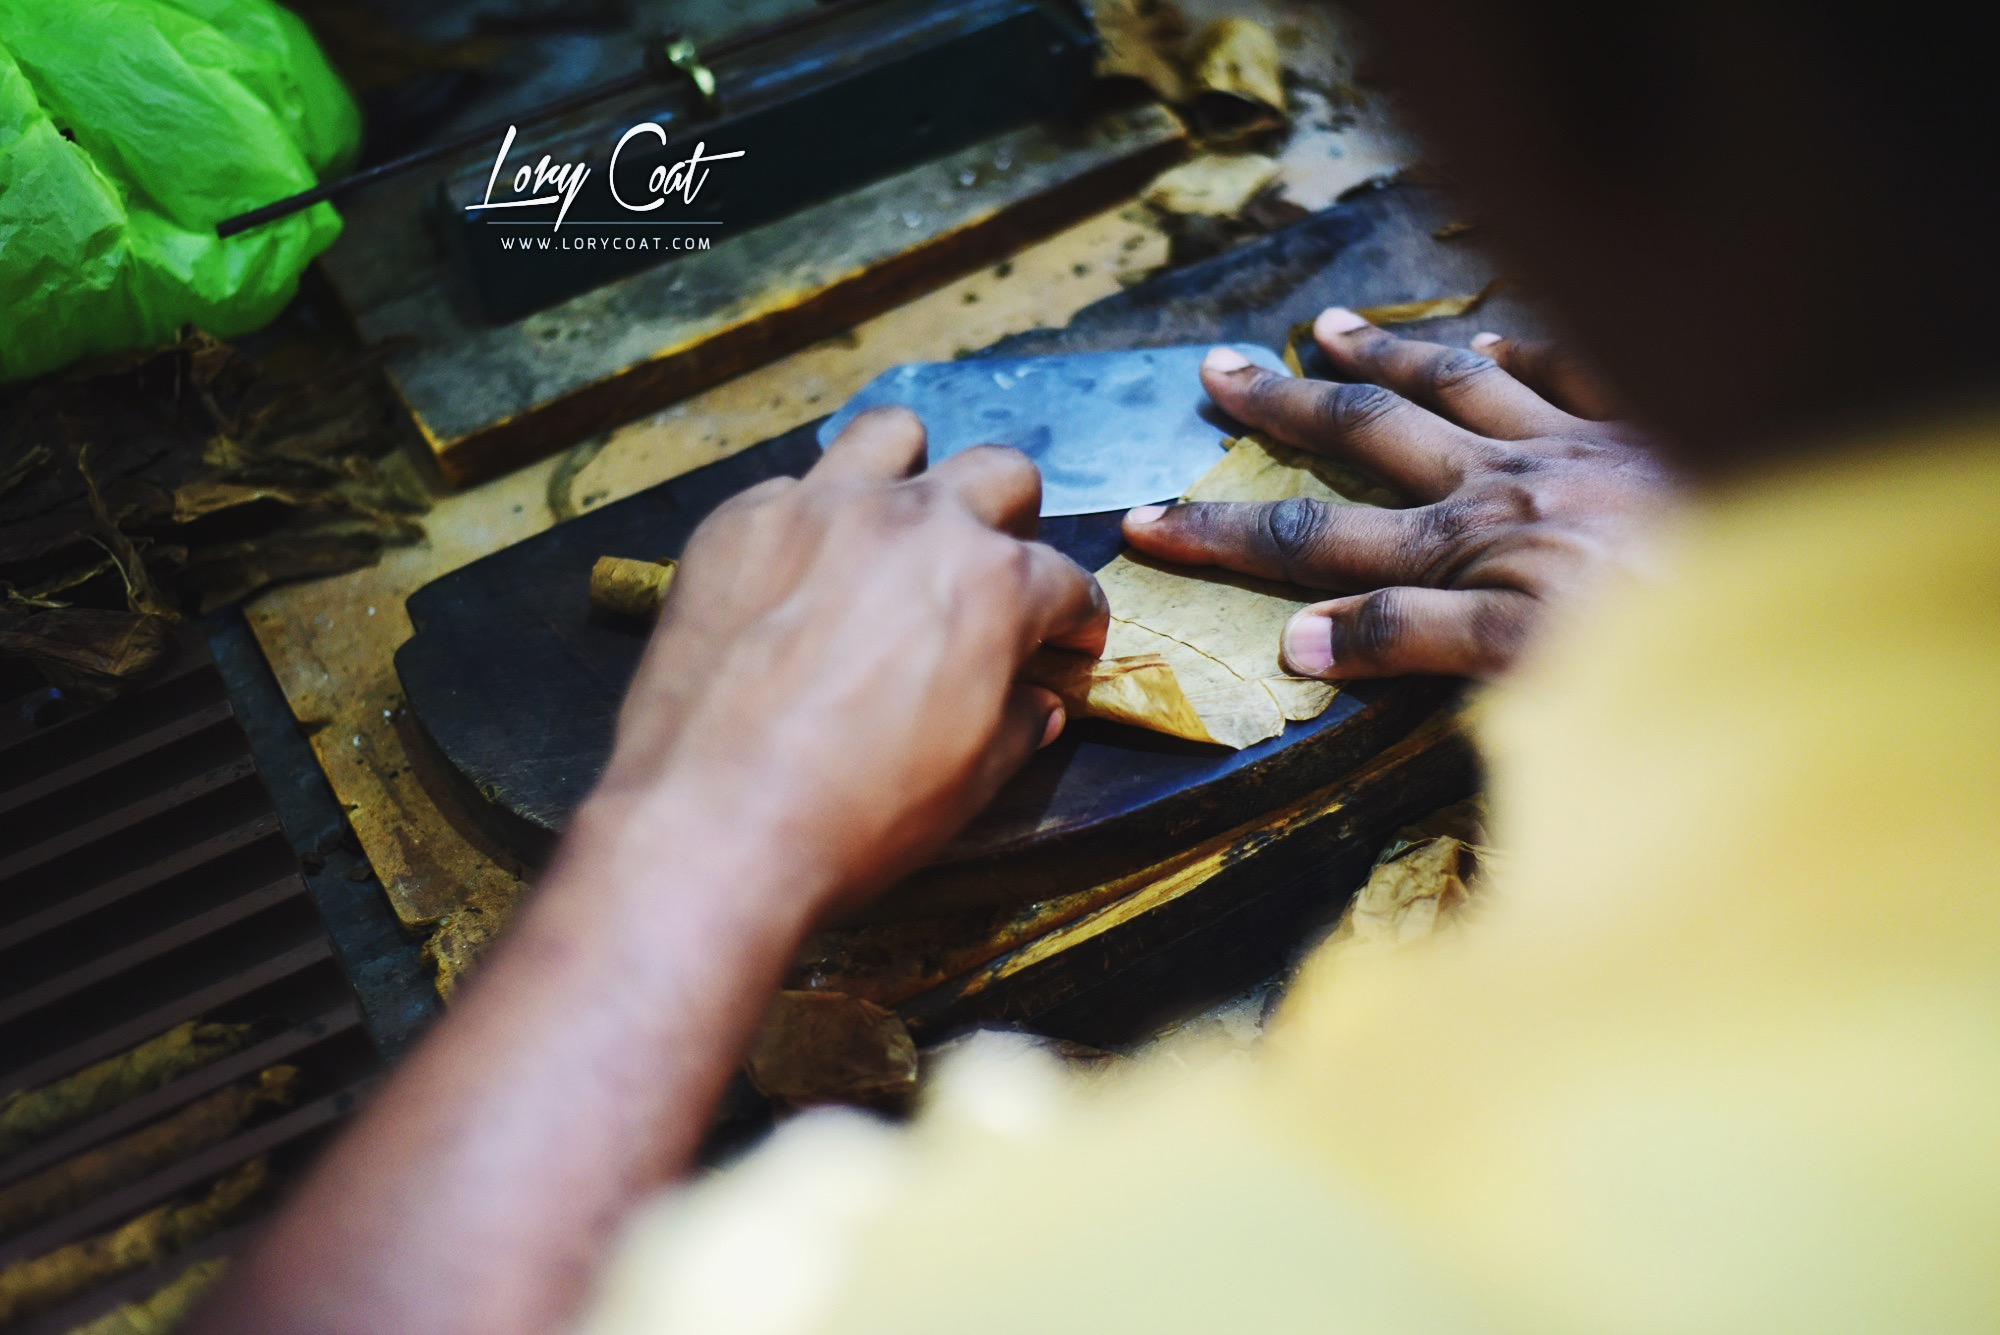 fabrication-tabac